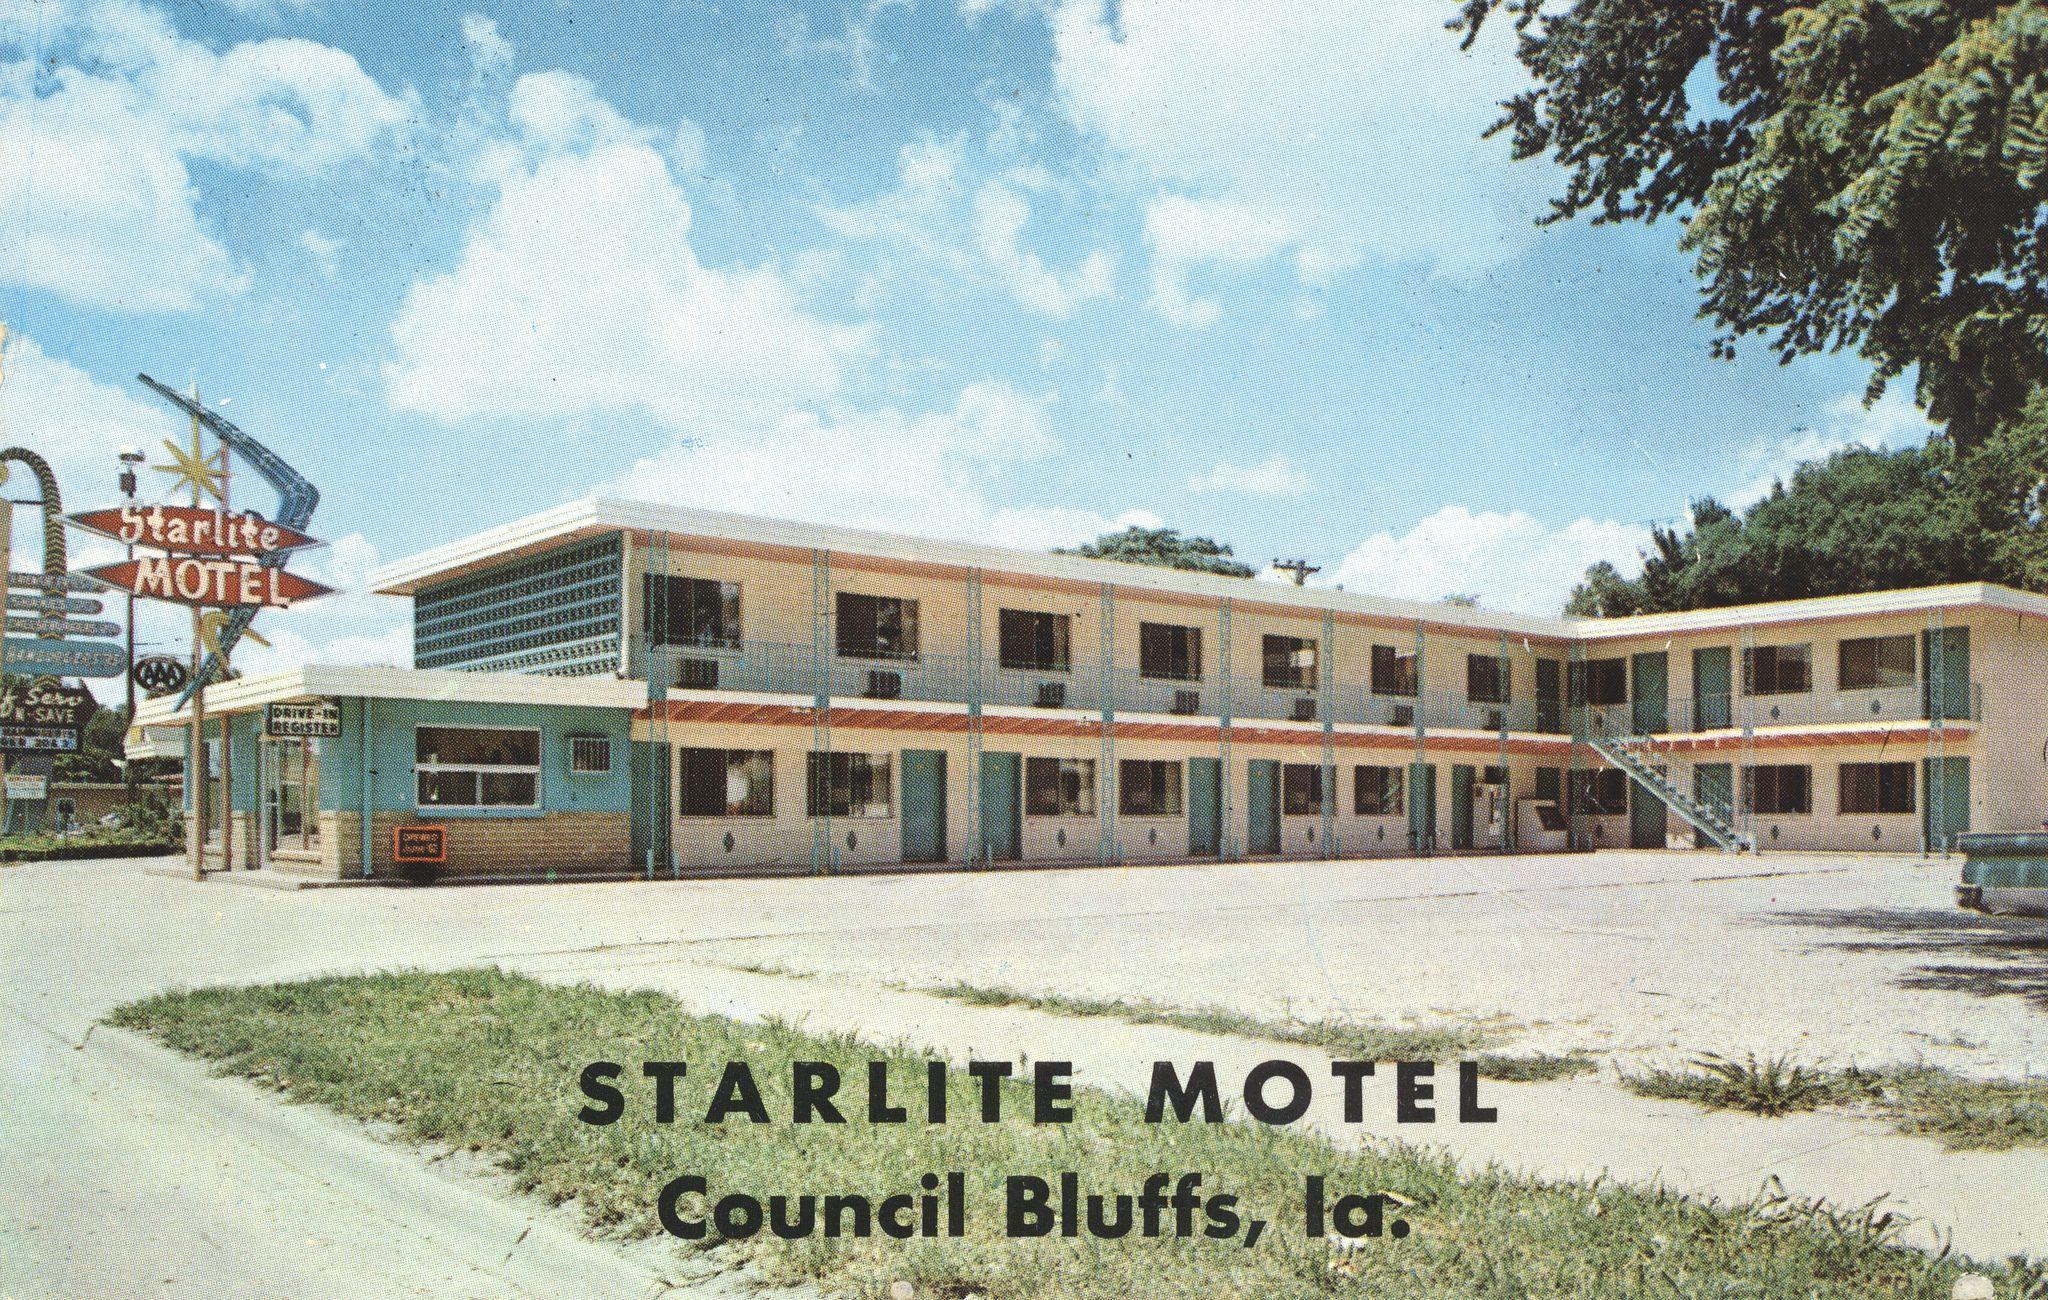 Starlite Motel Council Bluffs, Iowa Council bluffs